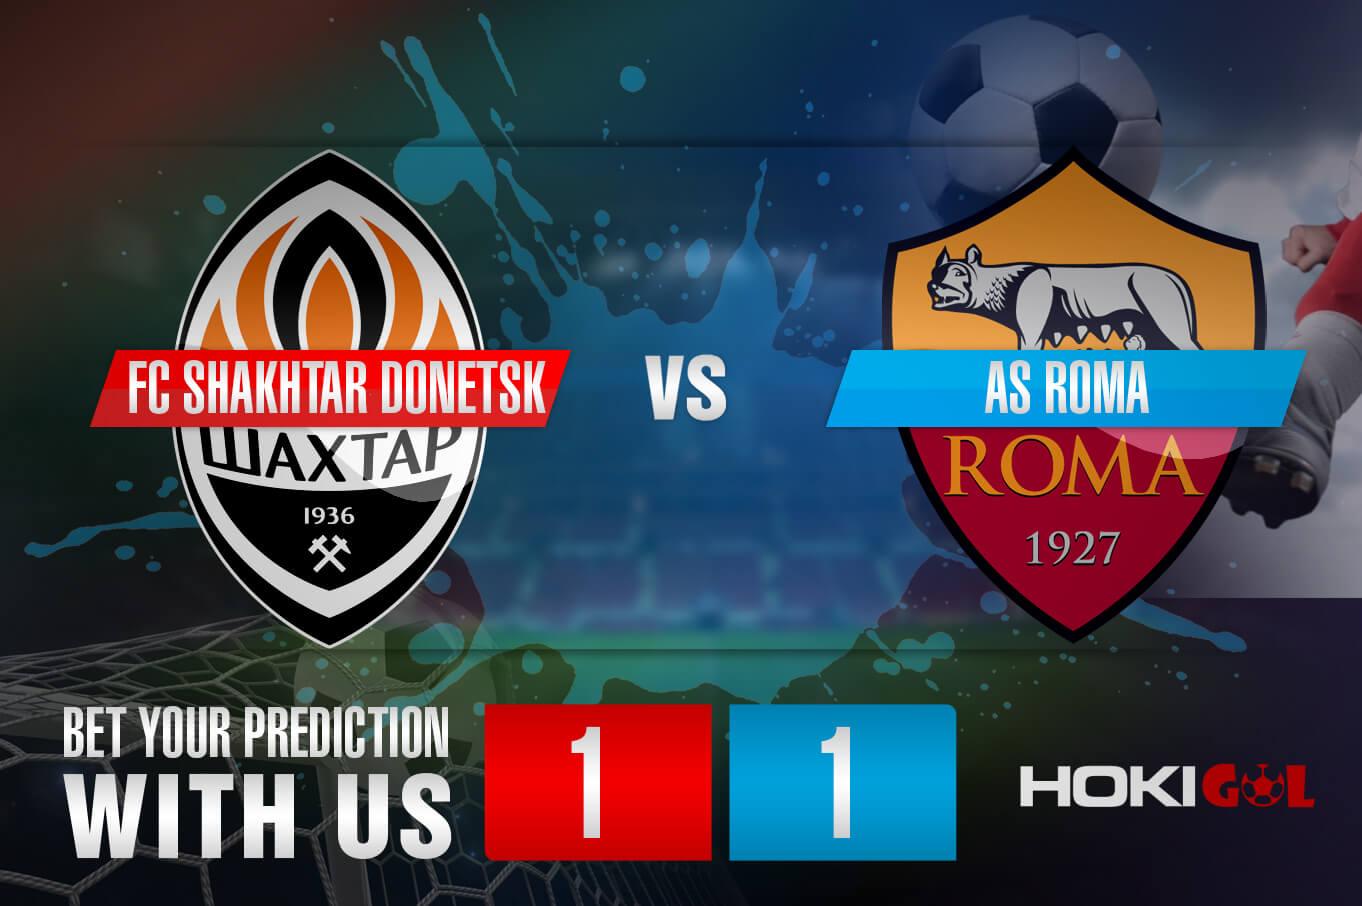 Prediksi Bola FC Shakhtar Donetsk Vs Roma 19 Maret 2021